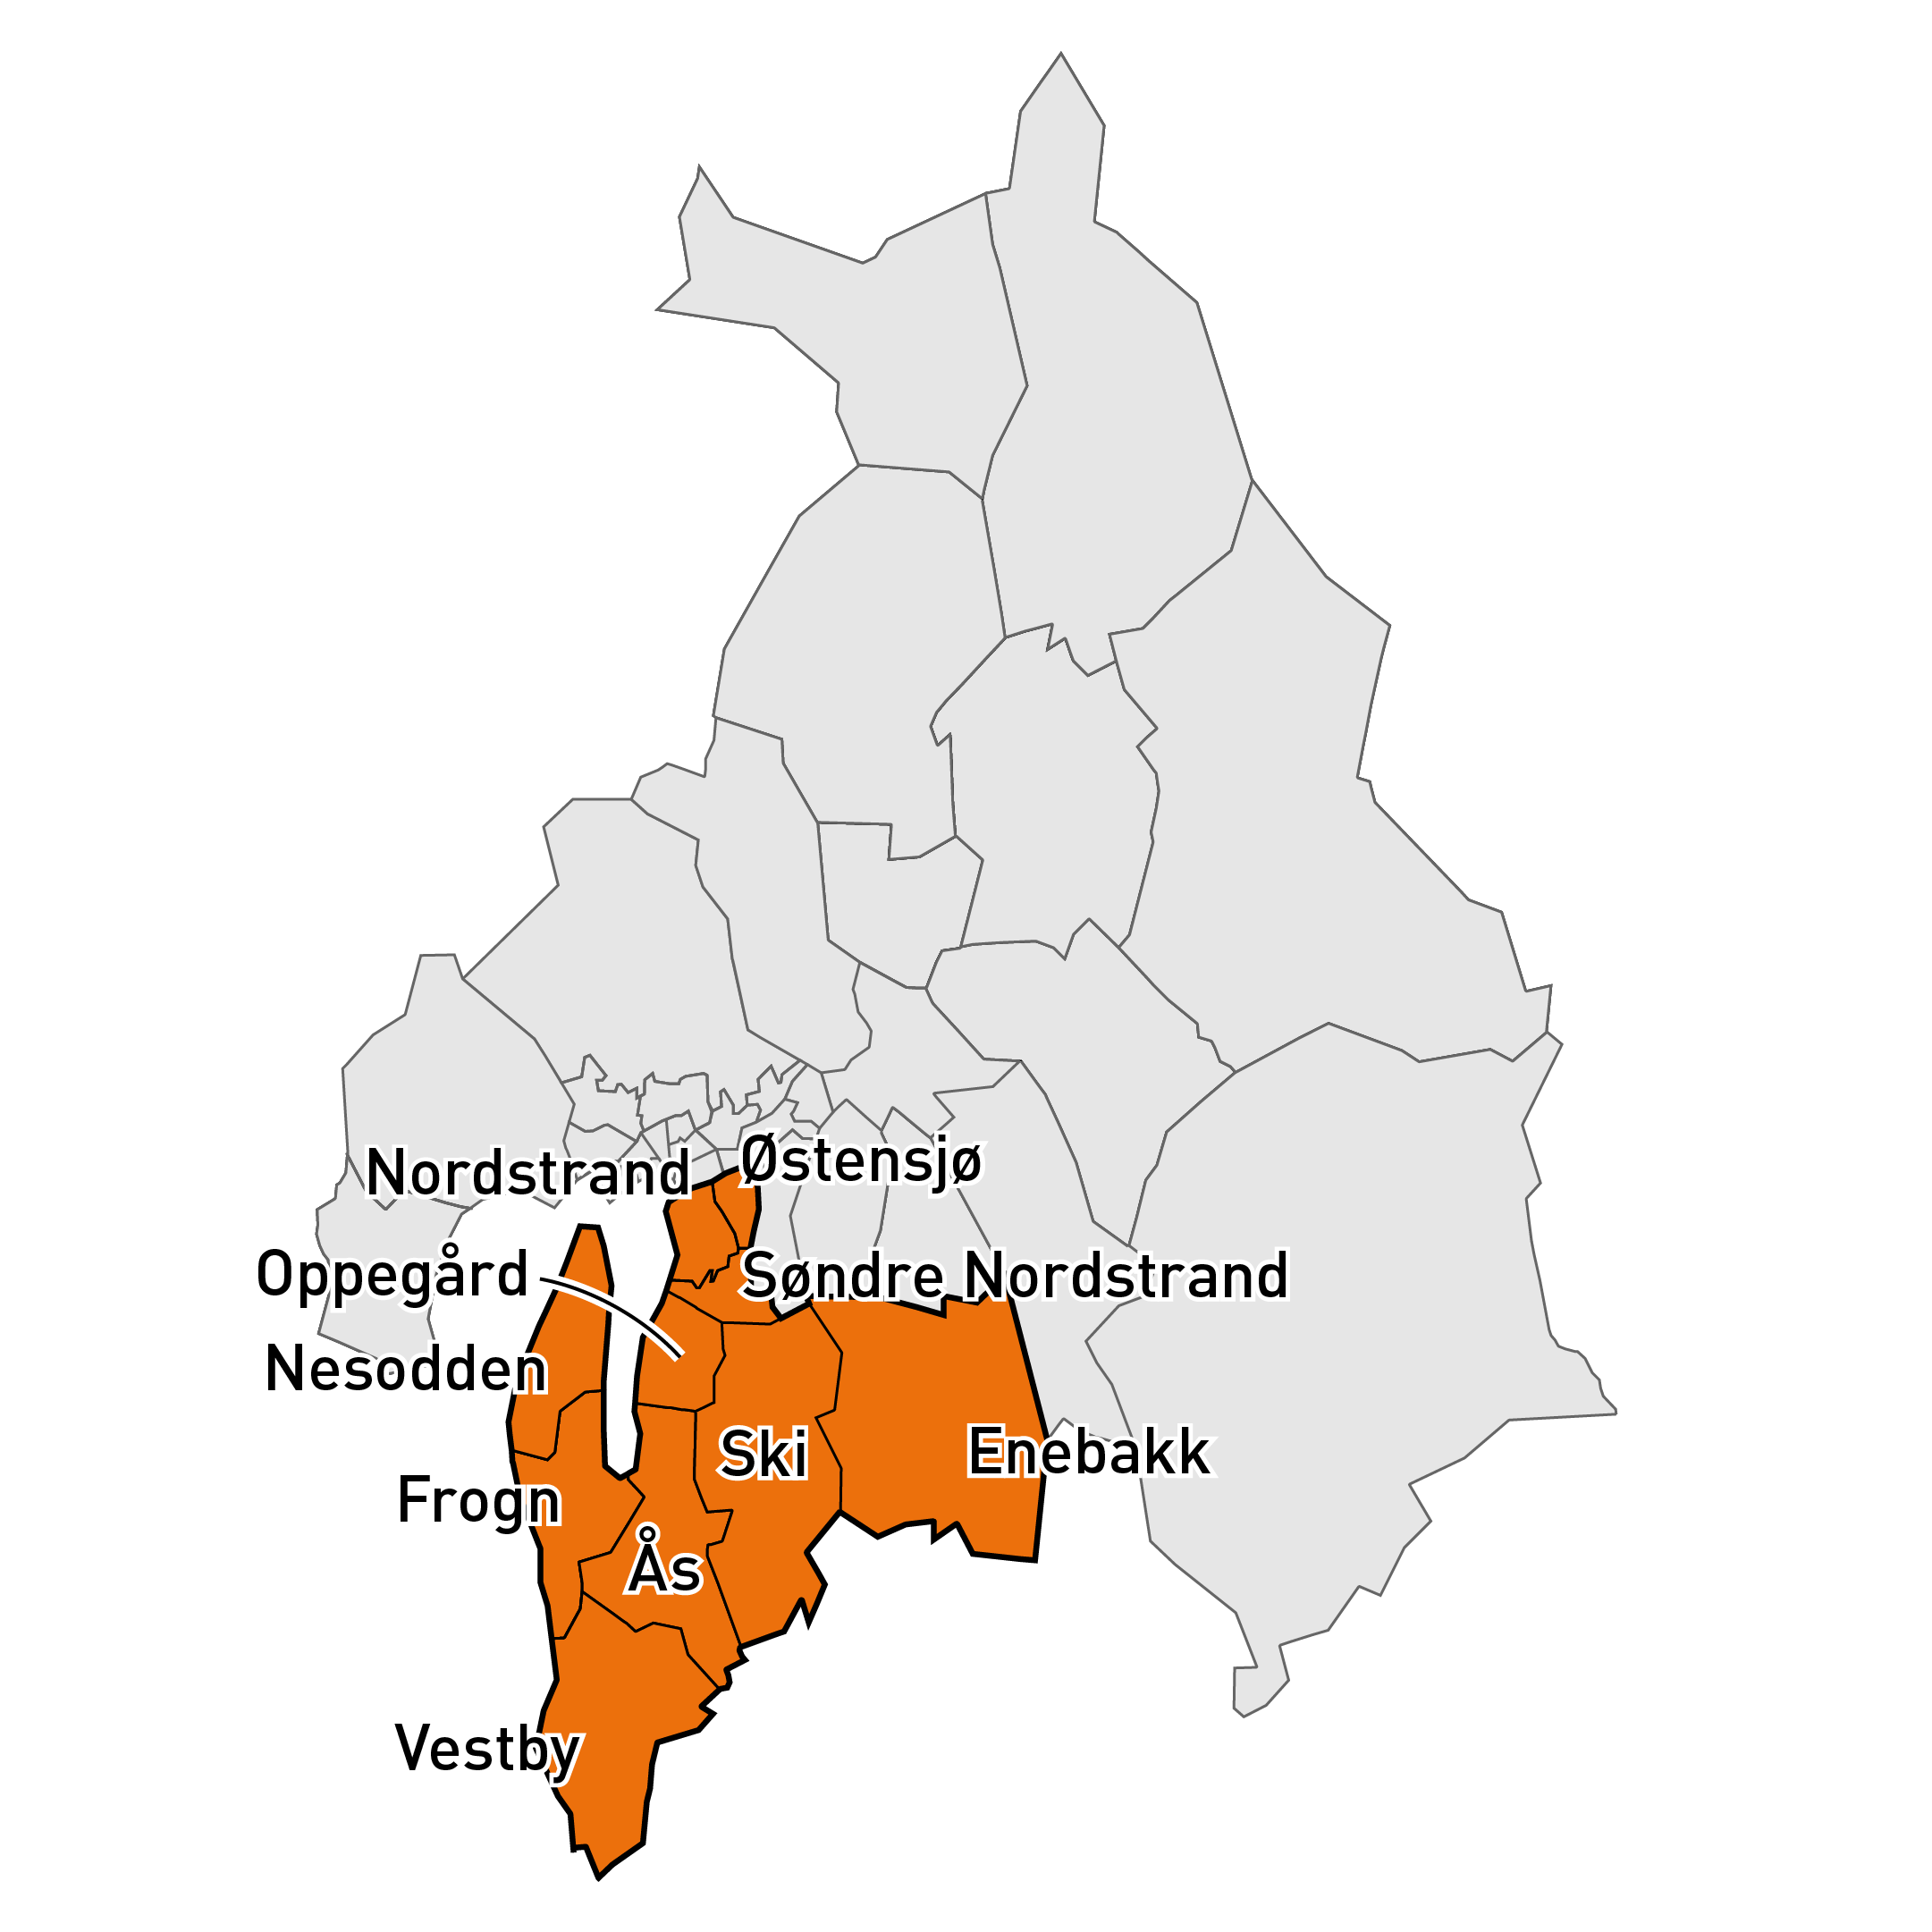 Bilde over markedsområde Sør